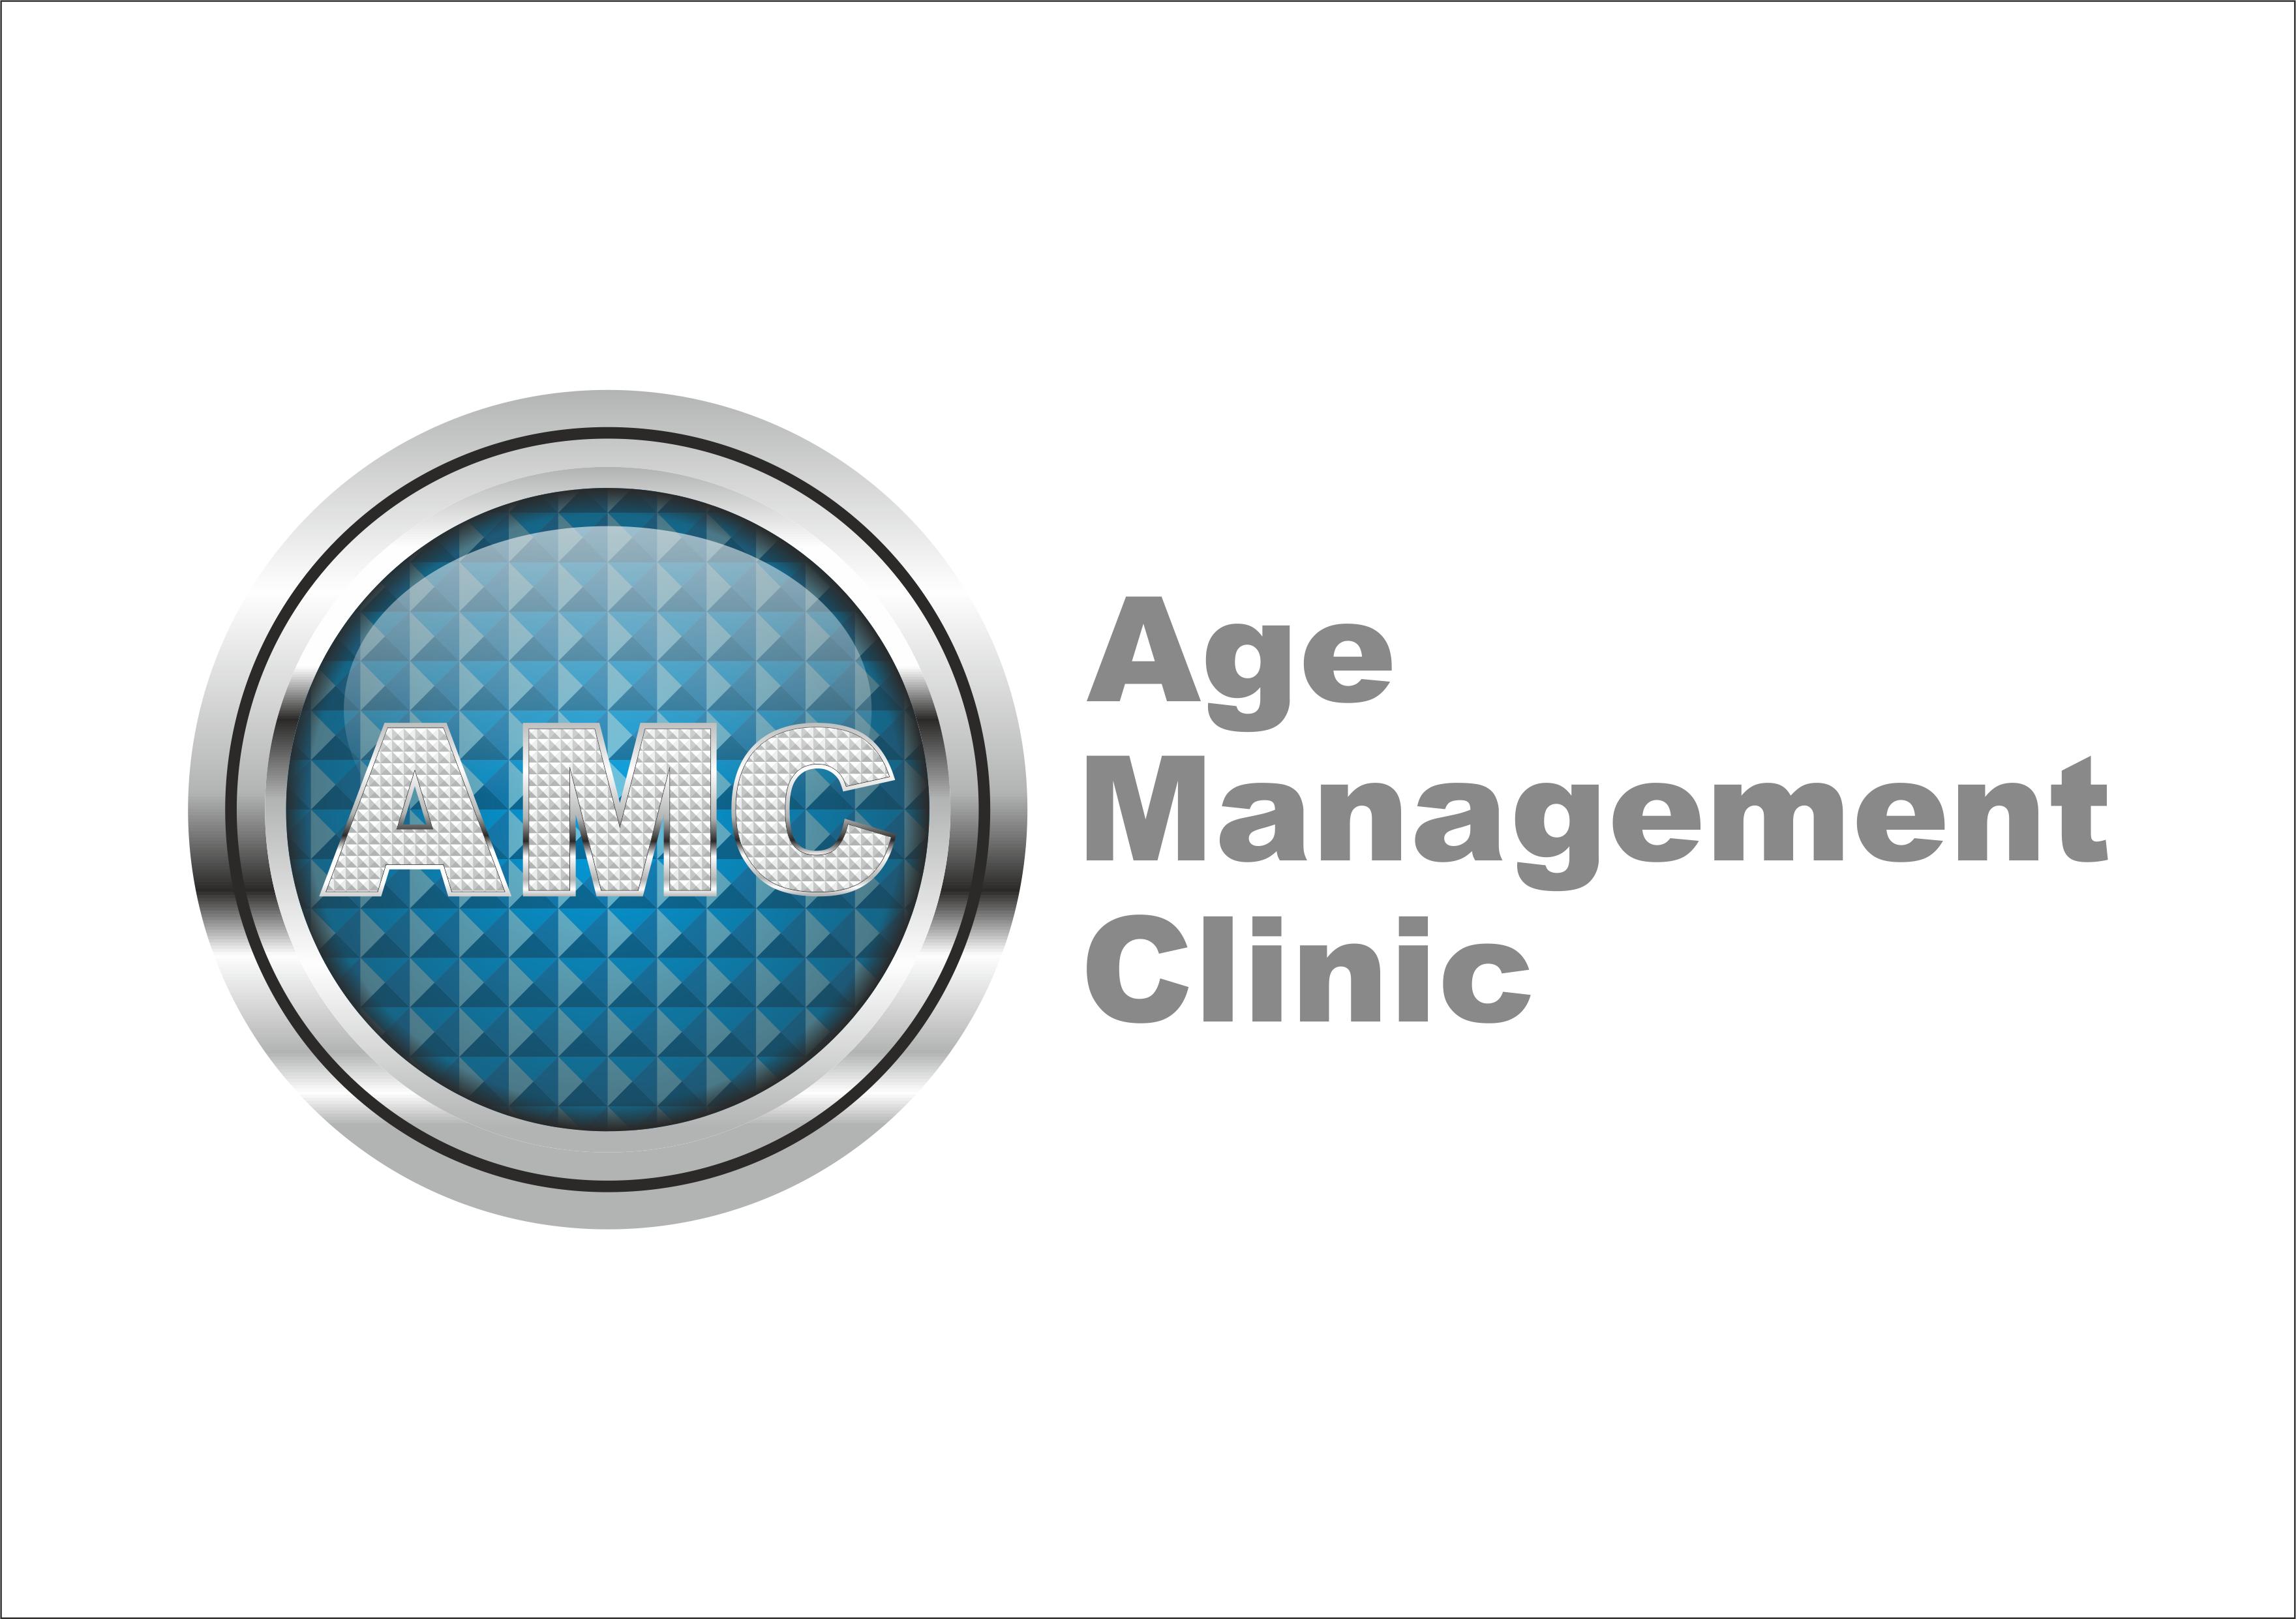 Логотип для медицинского центра (клиники)  фото f_9105b98dc3020969.png